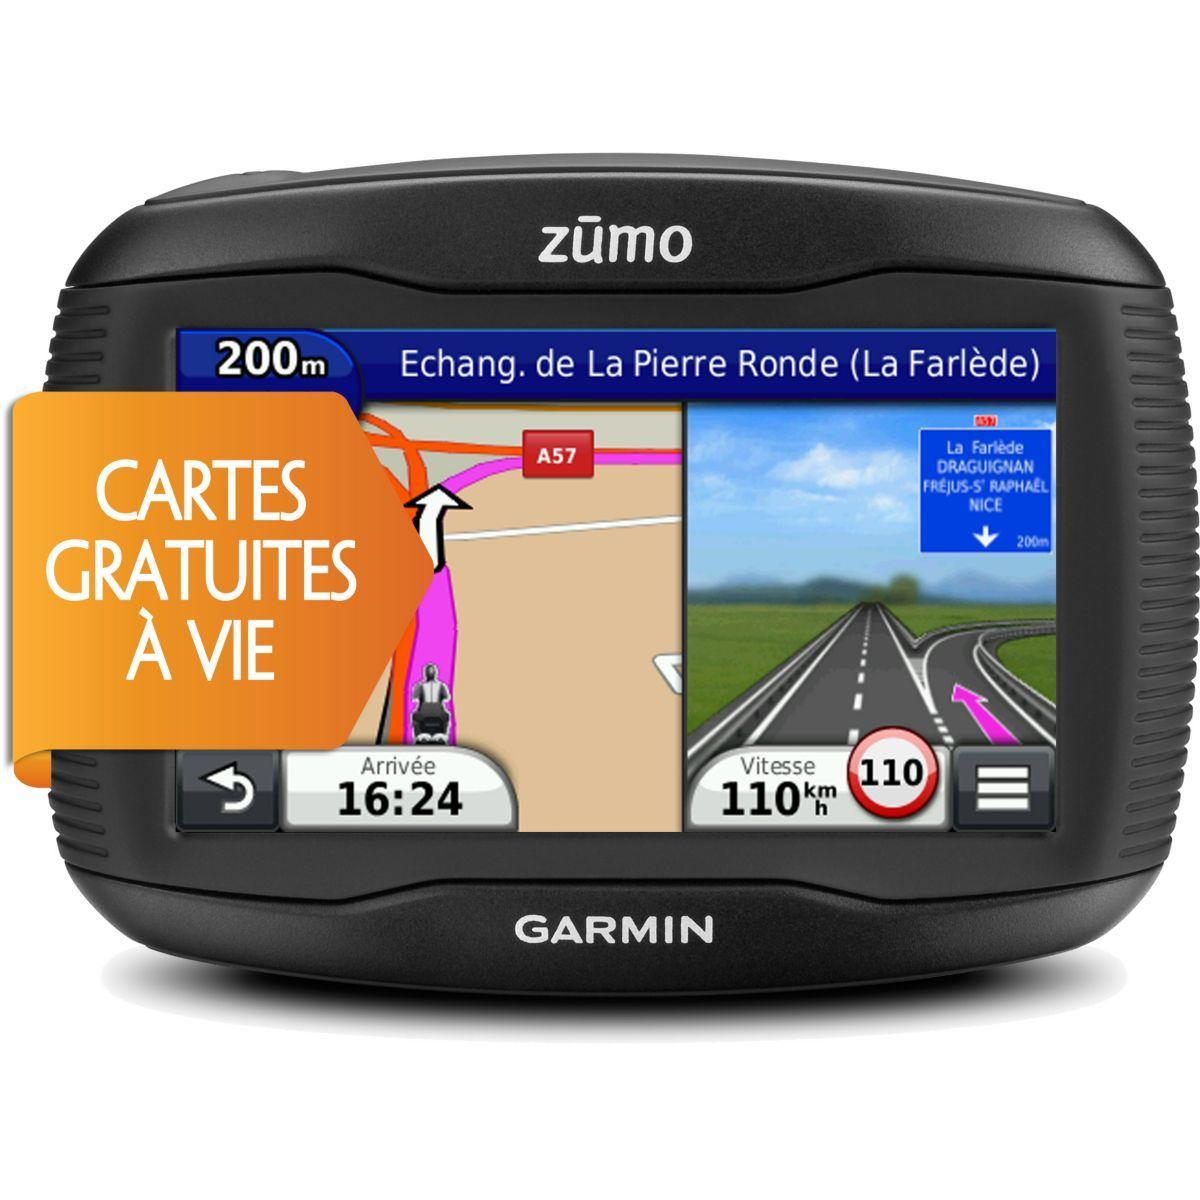 Gps garmin zumo 395 travel edition - livraison offerte : code livprem